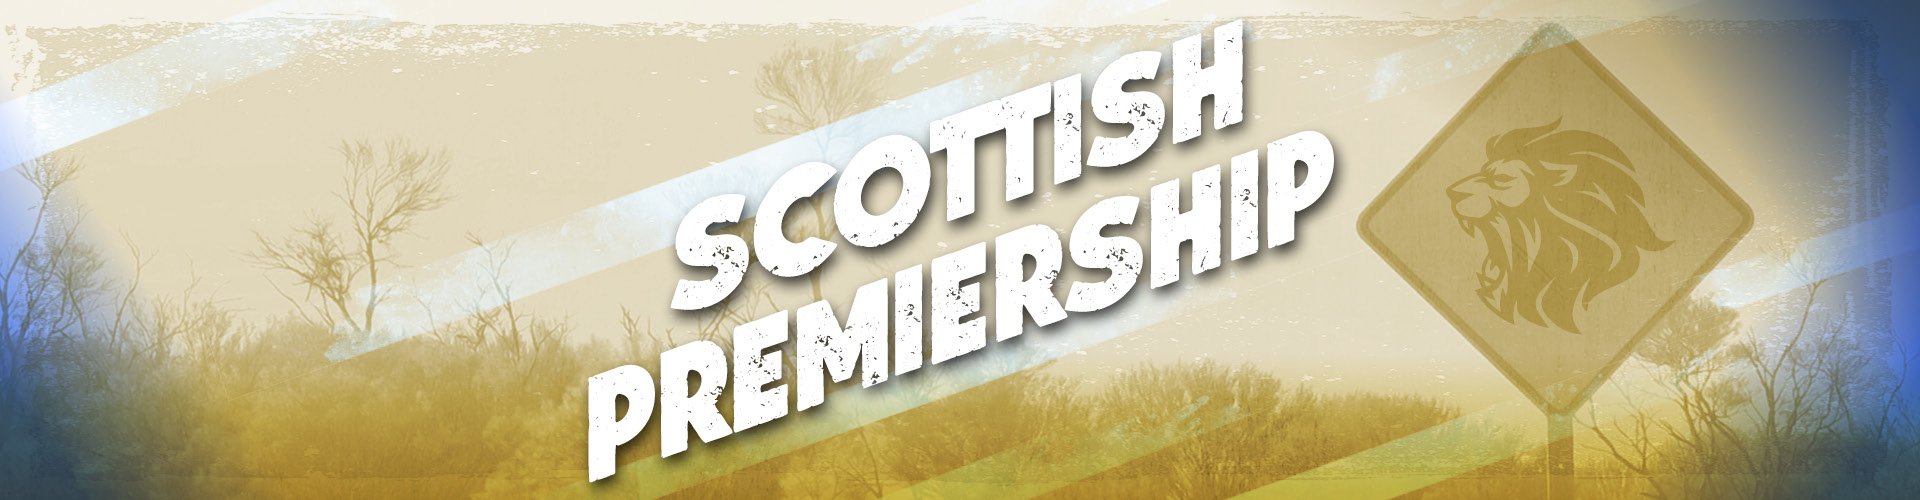 Scottish Premiership at Walkabout